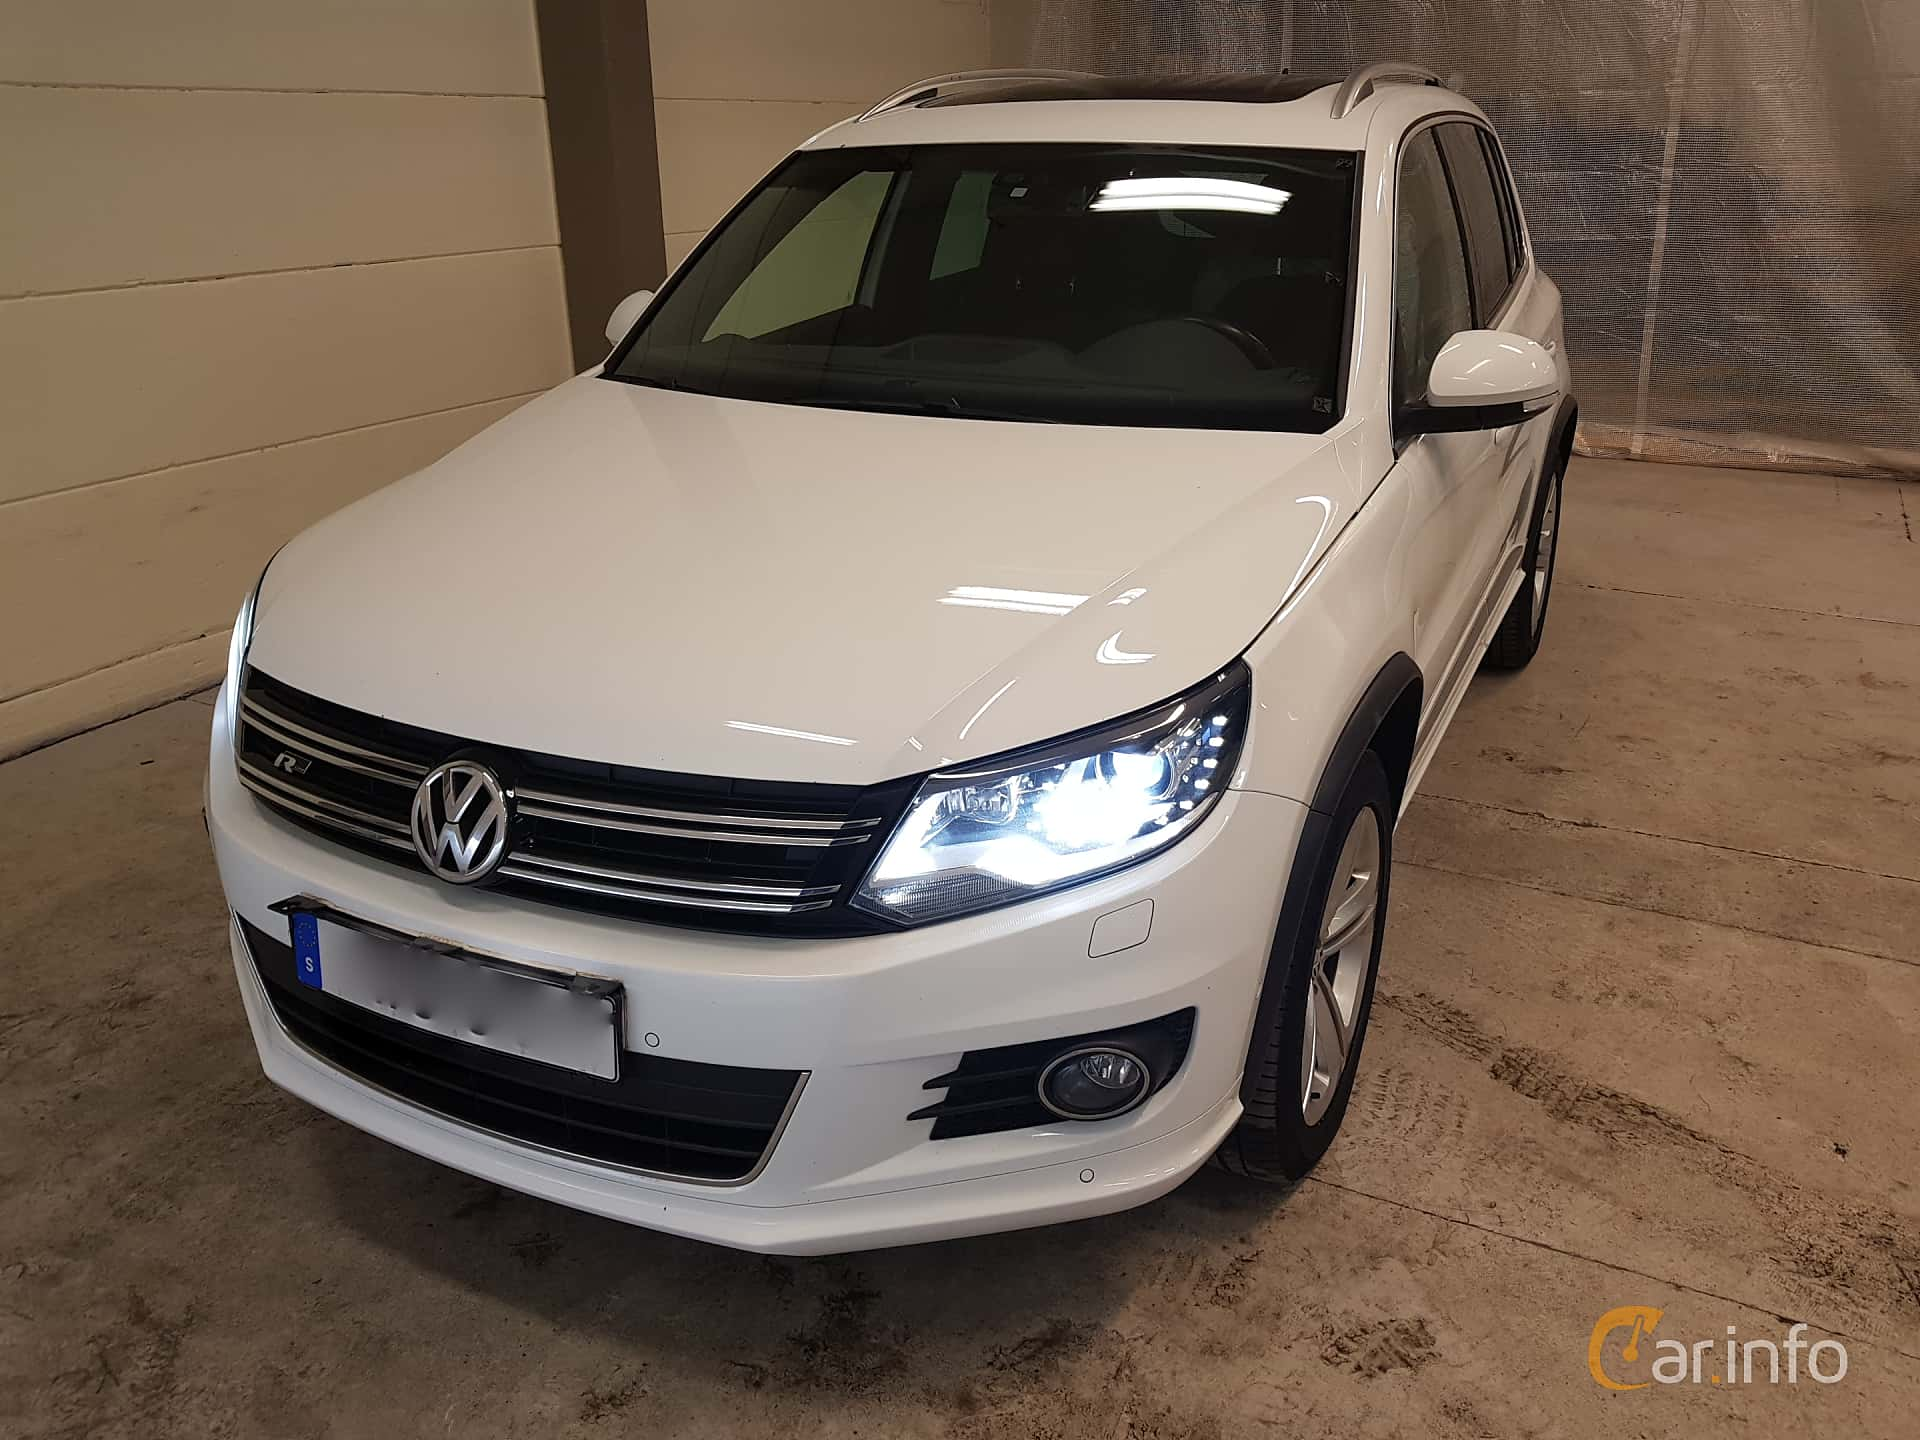 Volkswagen Tiguan 2.0 TDI 4Motion DSG Sequential, 184hp, 2016